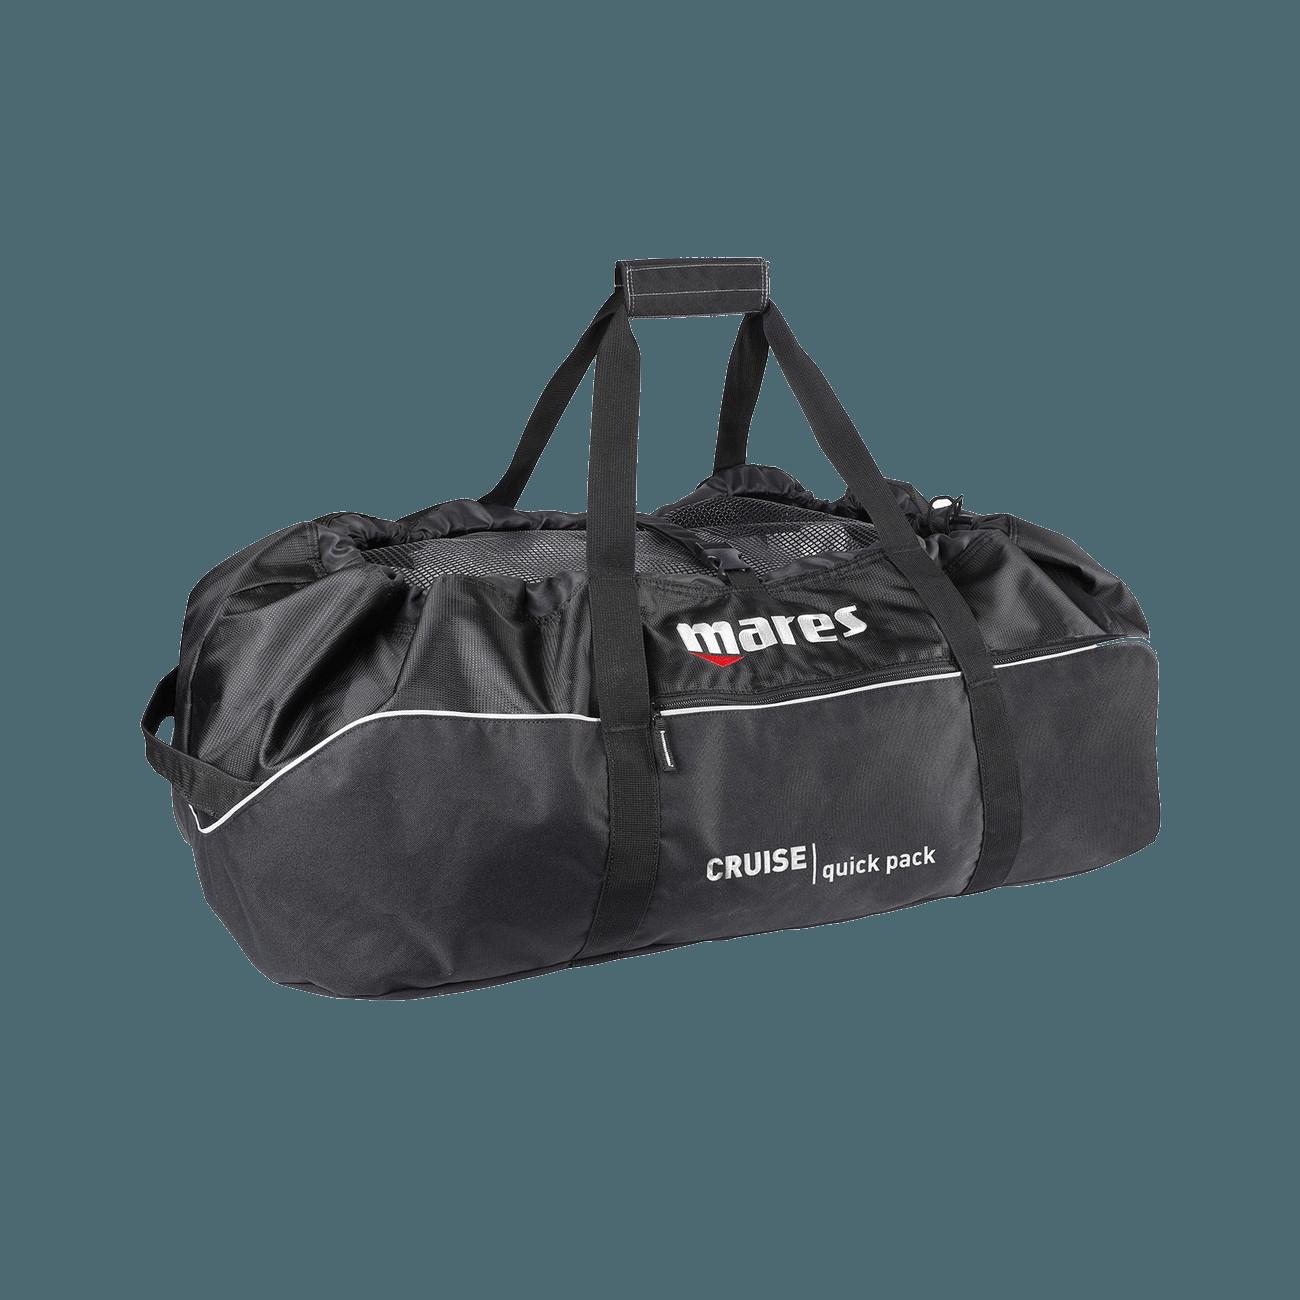 Mares Cruise Quick Pack Bag | Mares Bags | Mares Singapore